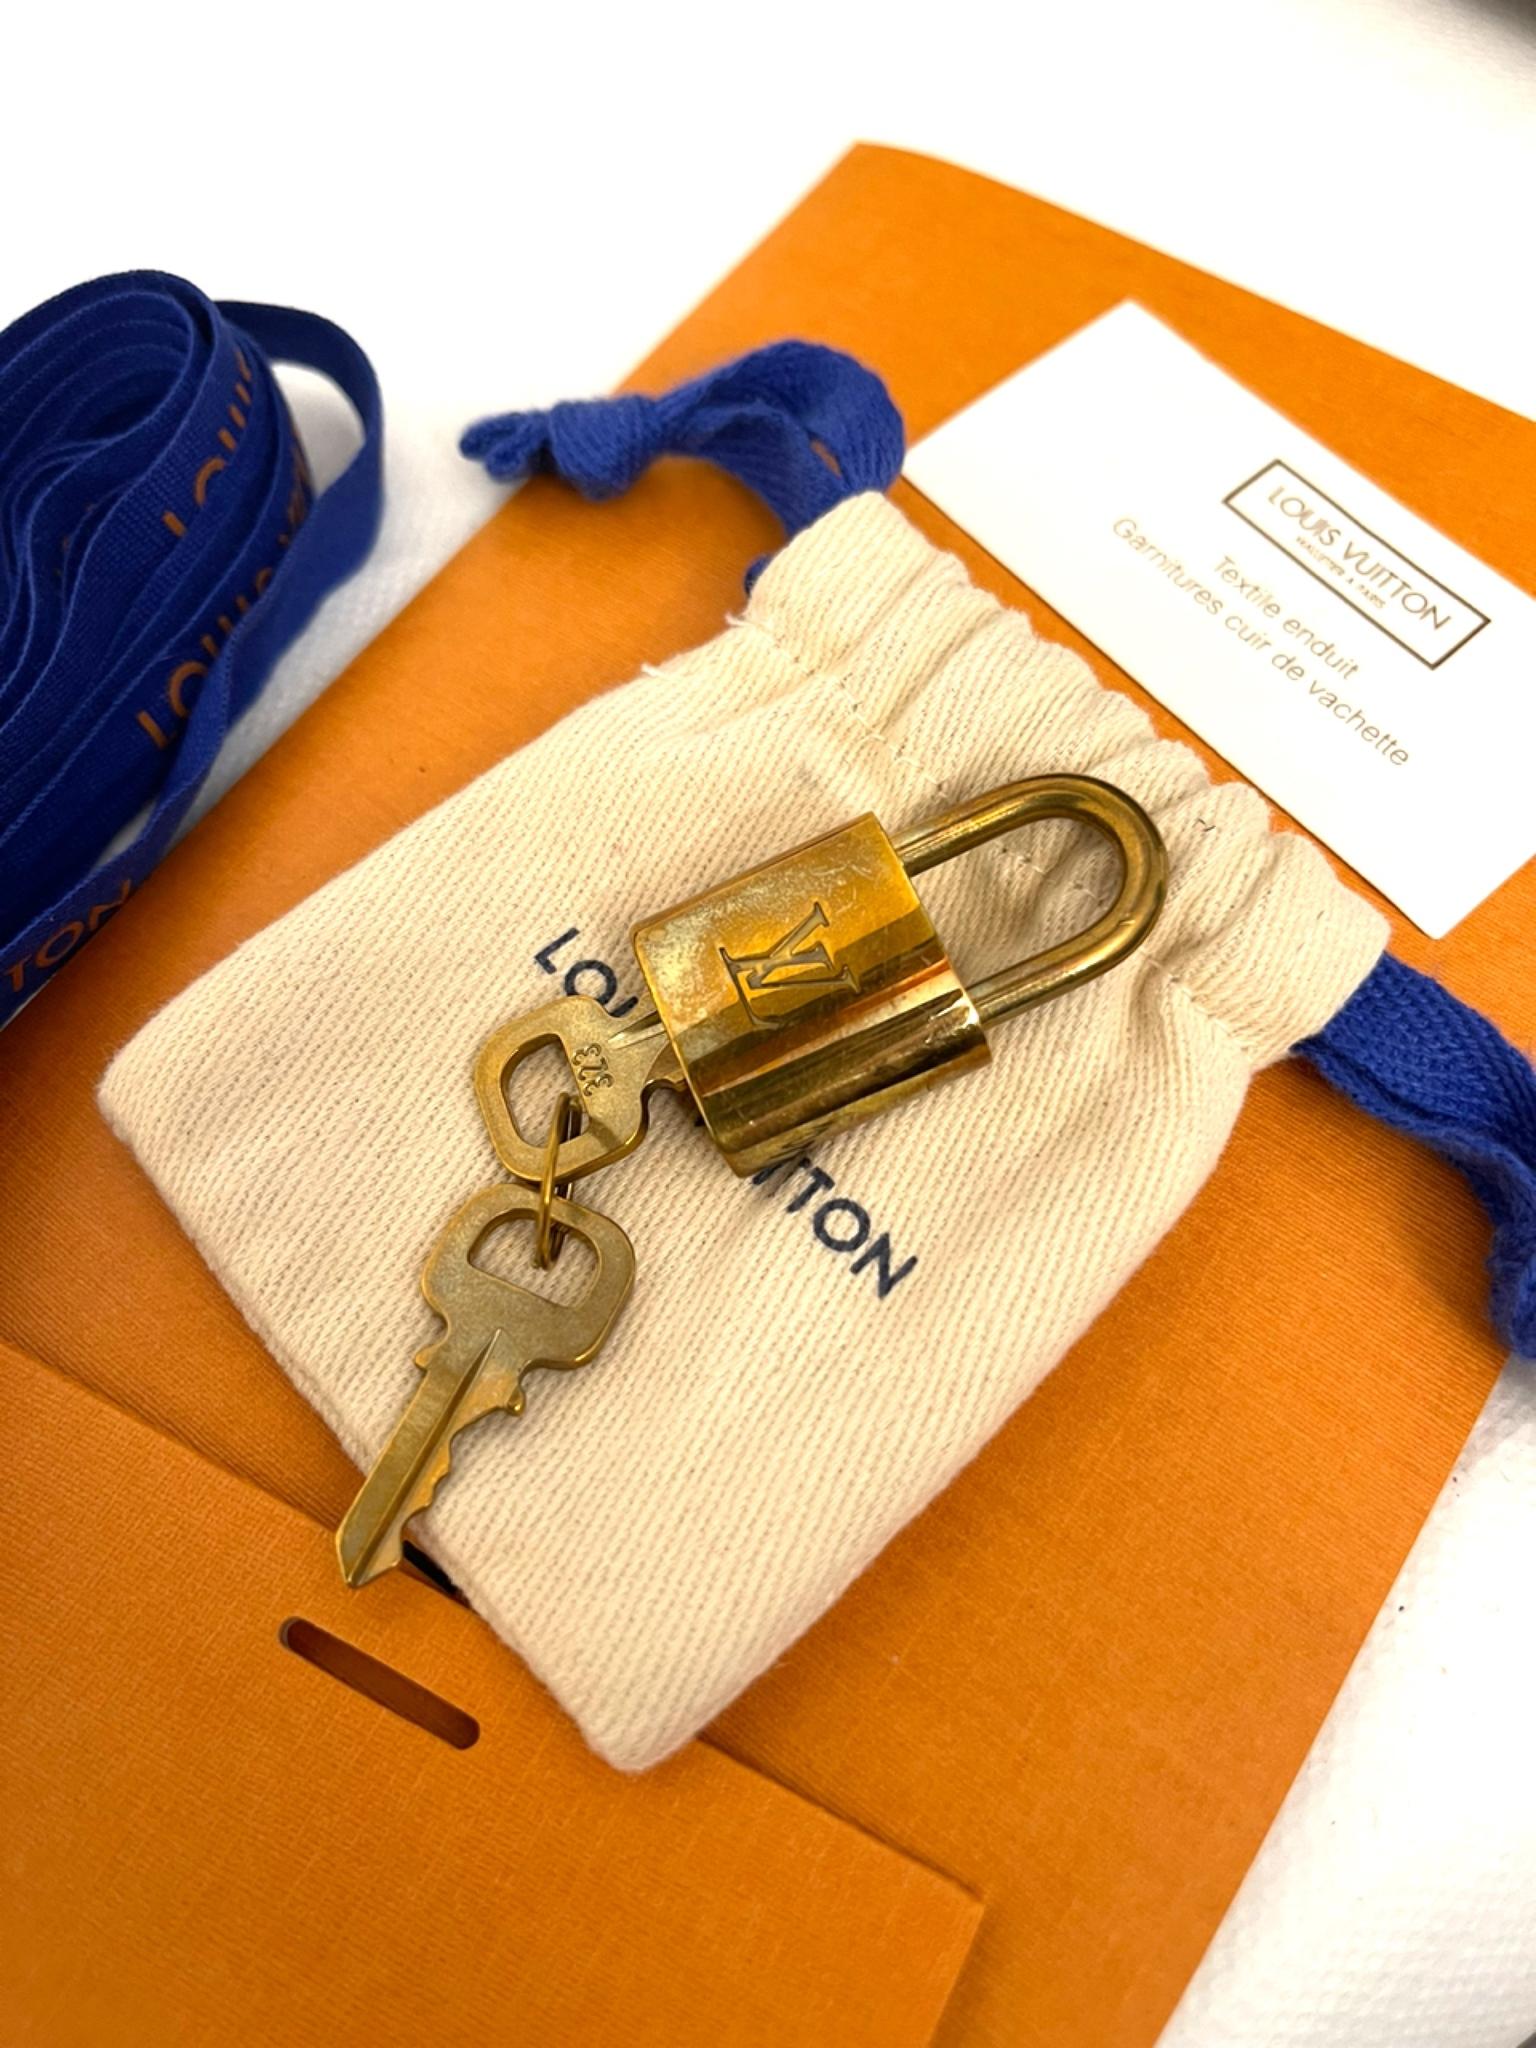 Louis Vuitton Speedy 25 Bandouliere Damier Ebene Bag